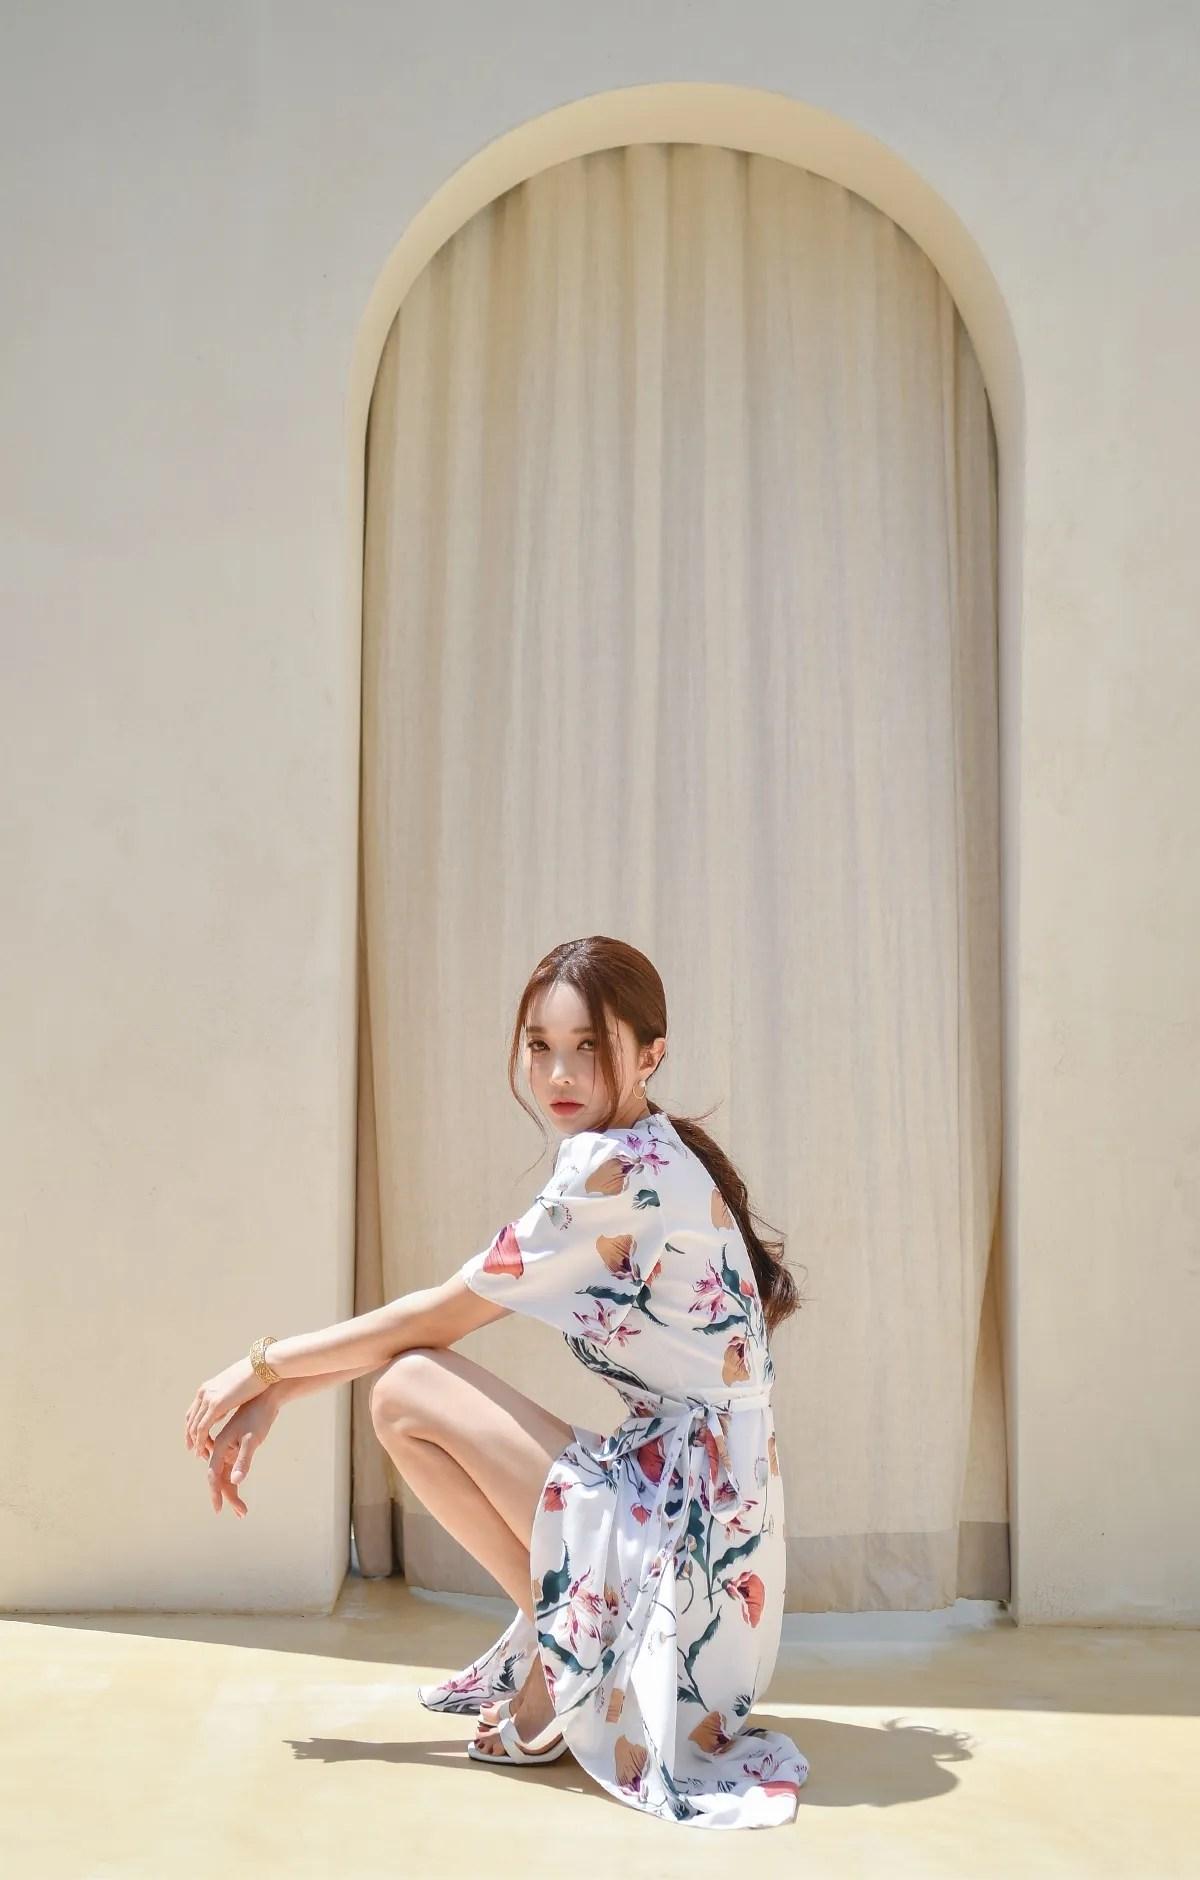 Park Suyeon / vendis / May 2021 / Sundress & Monokini Photoshoot Part 2